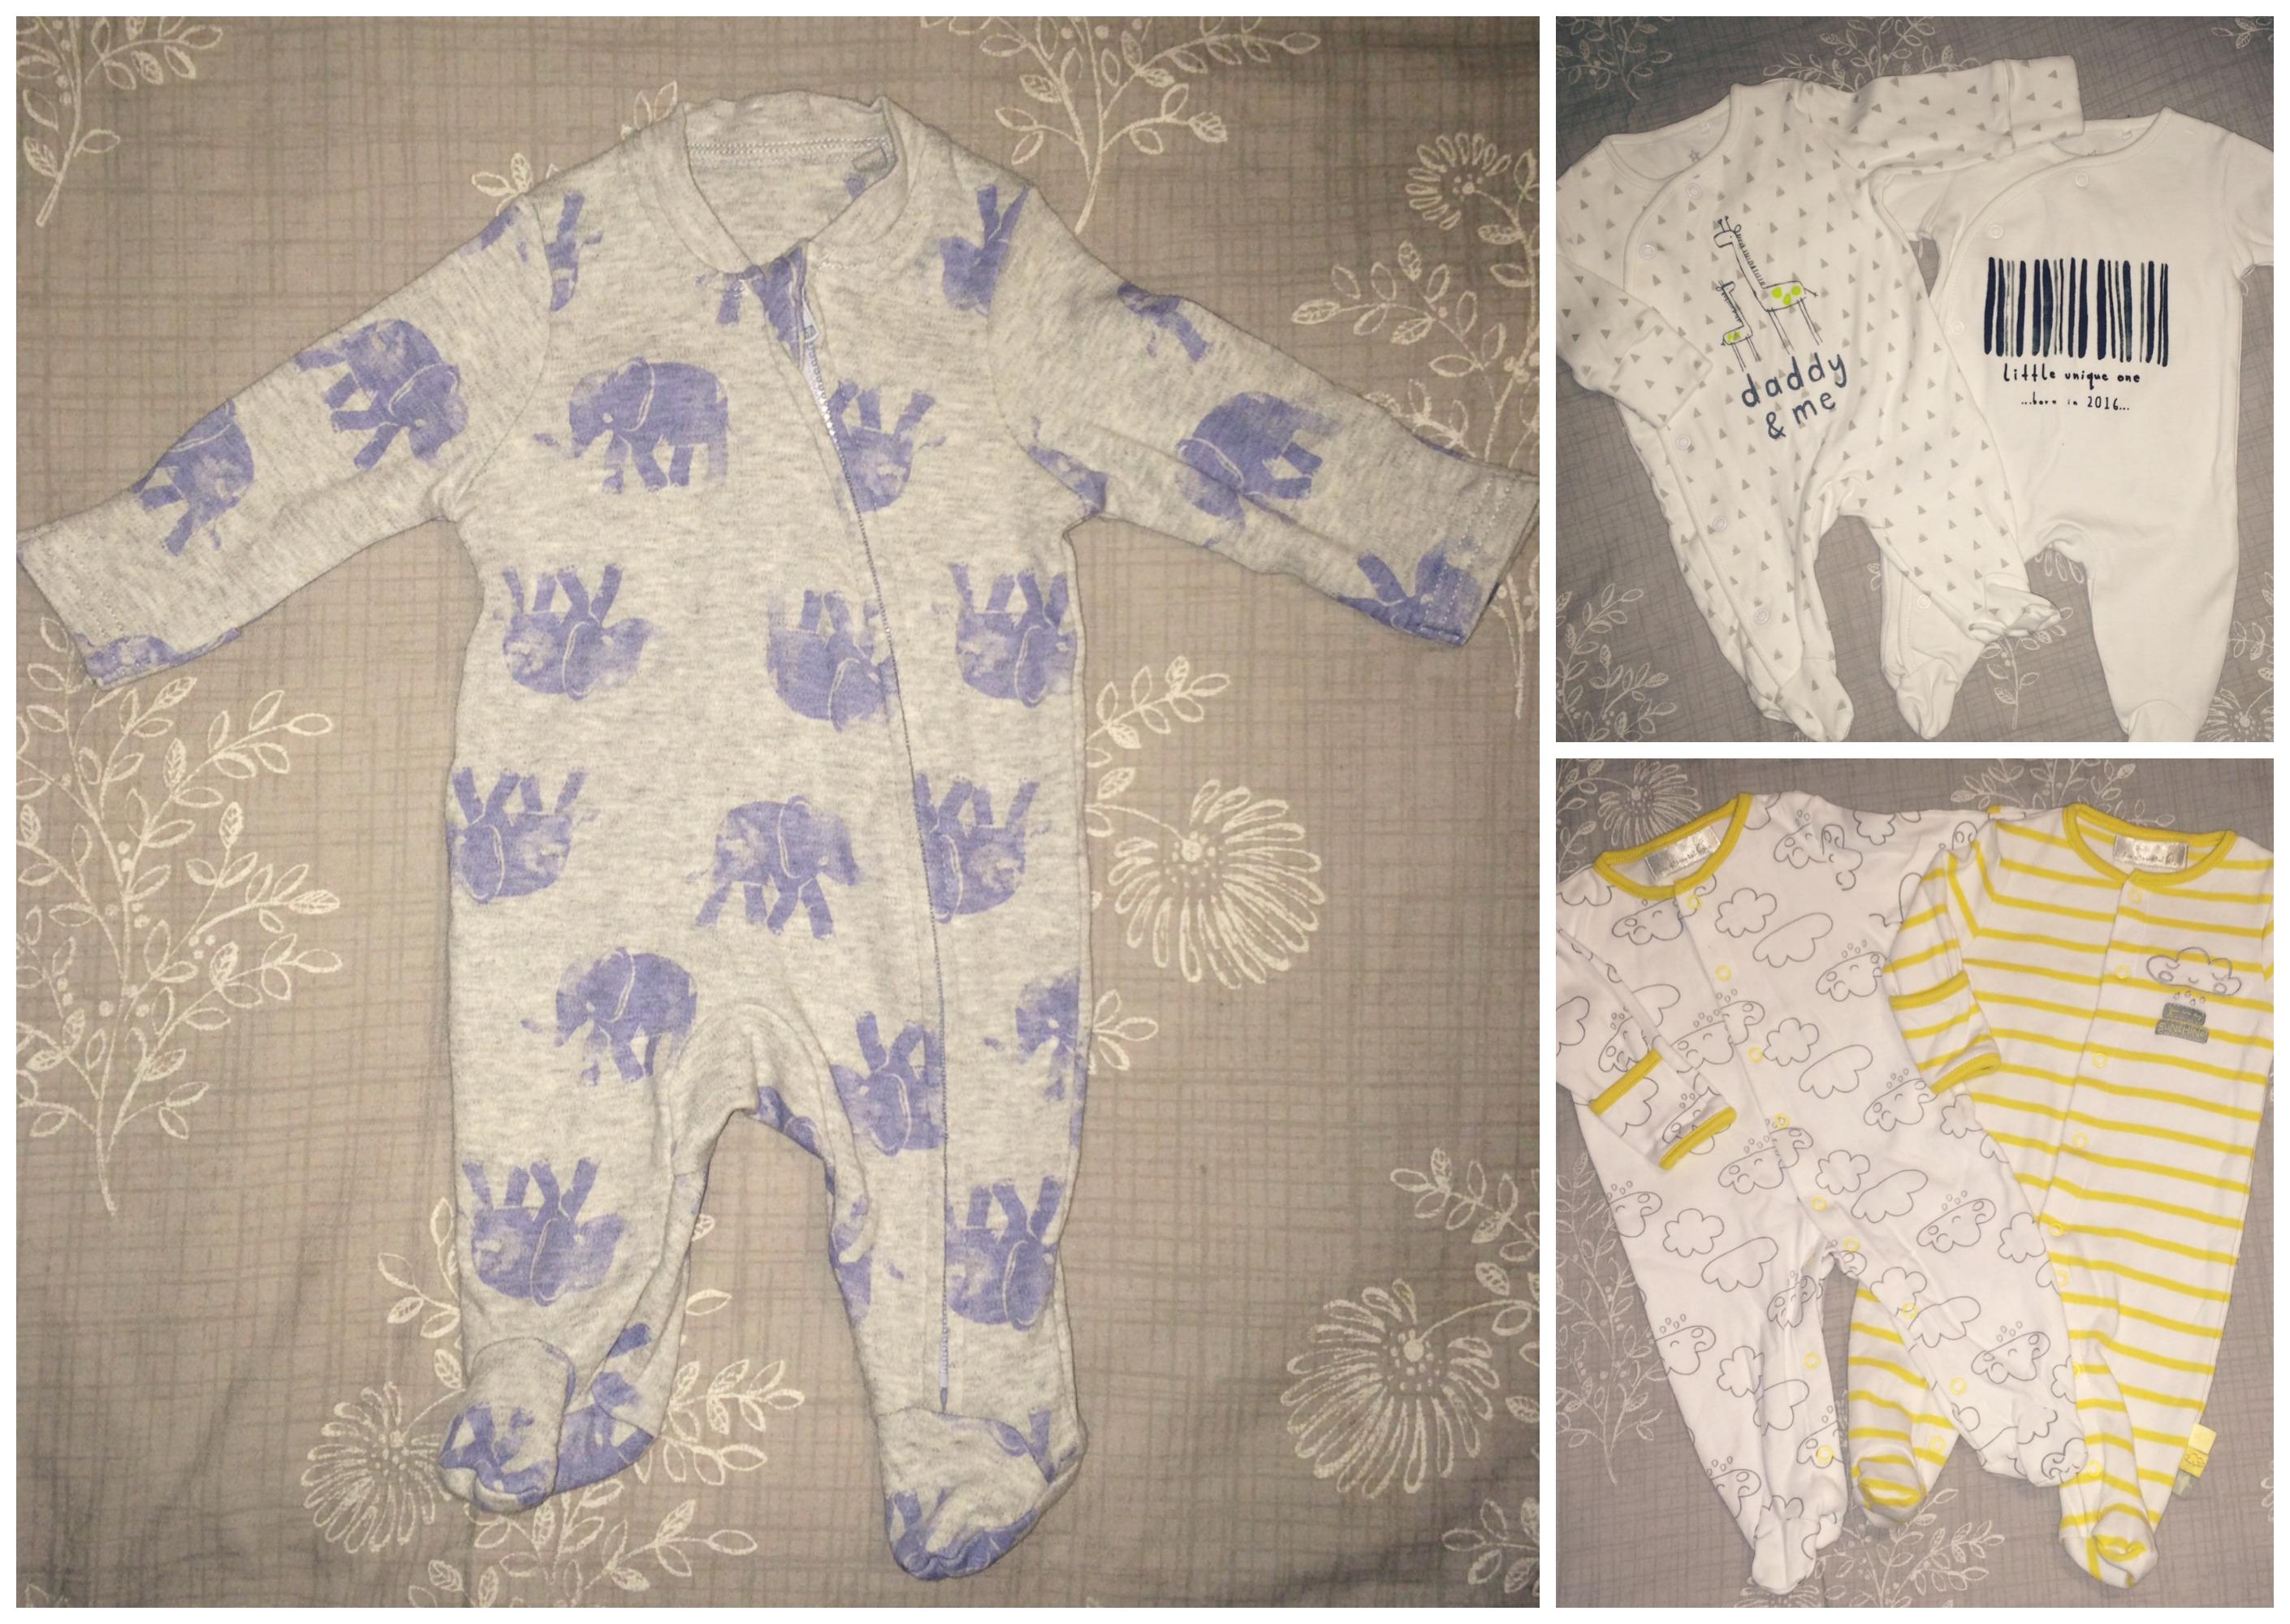 baby hospital bag sleepsuits